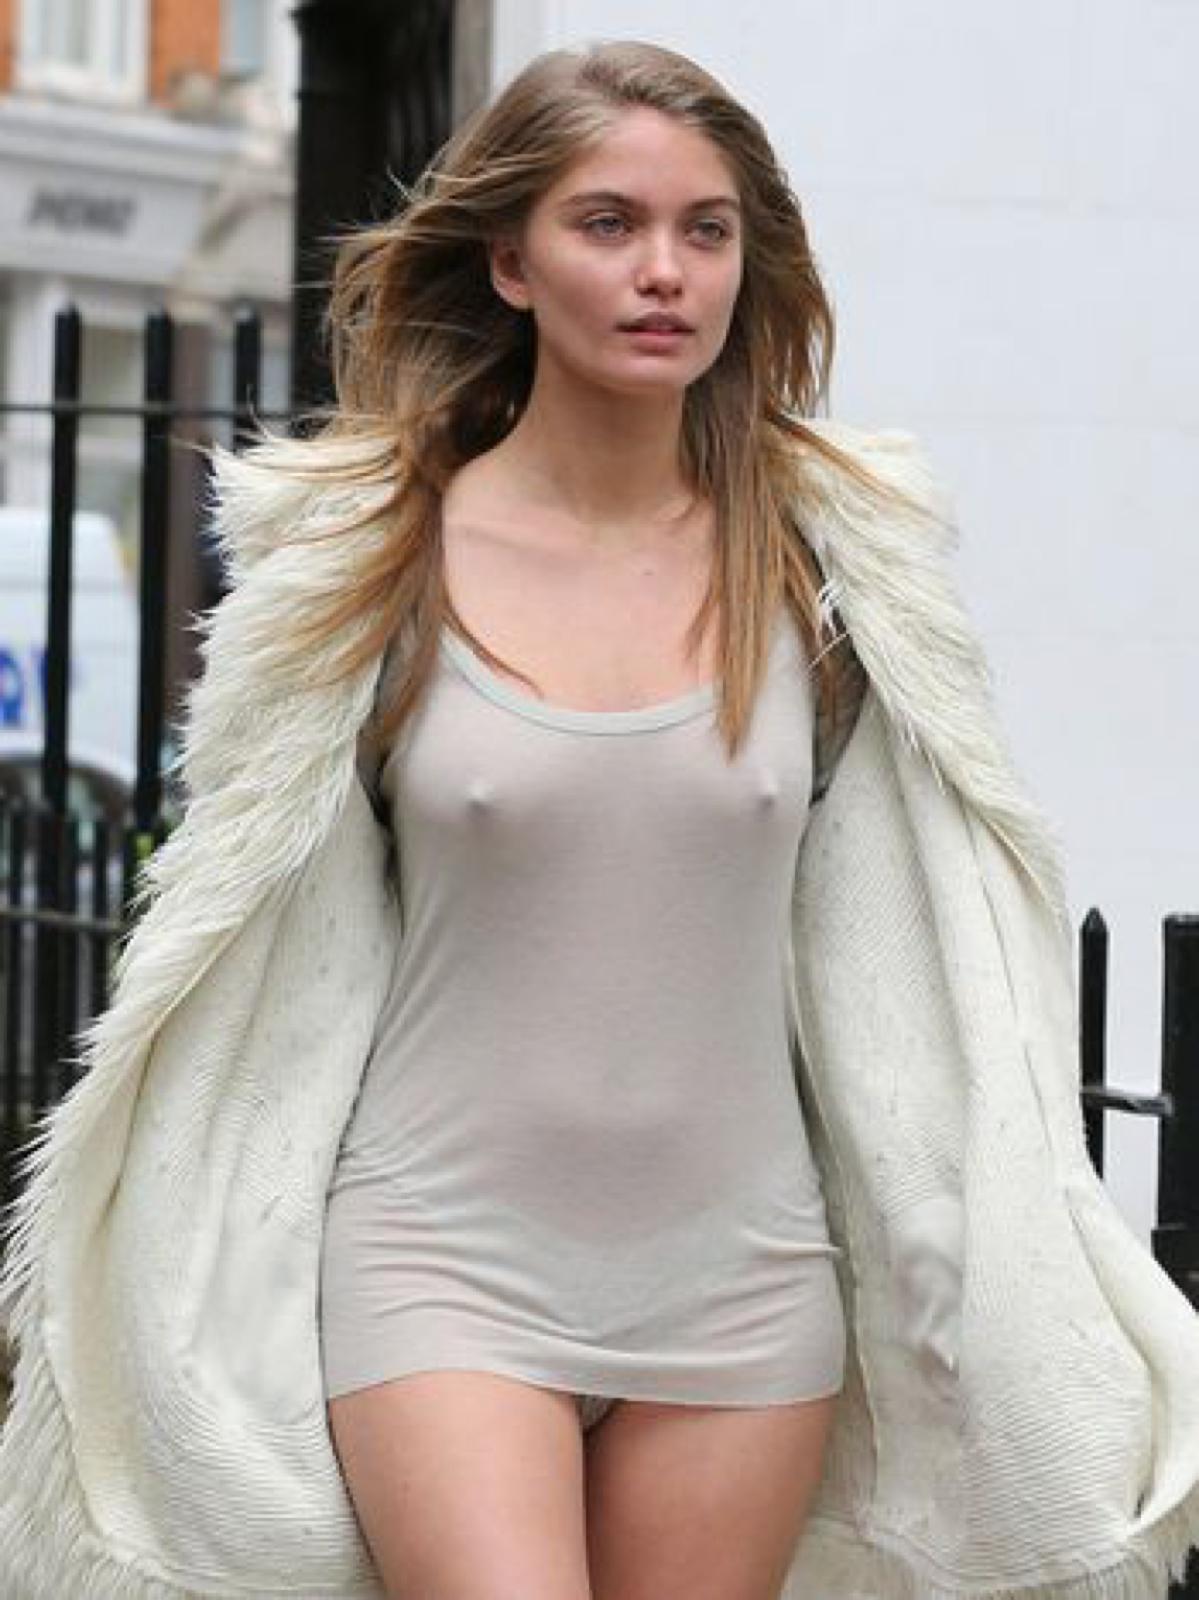 erect-nipples